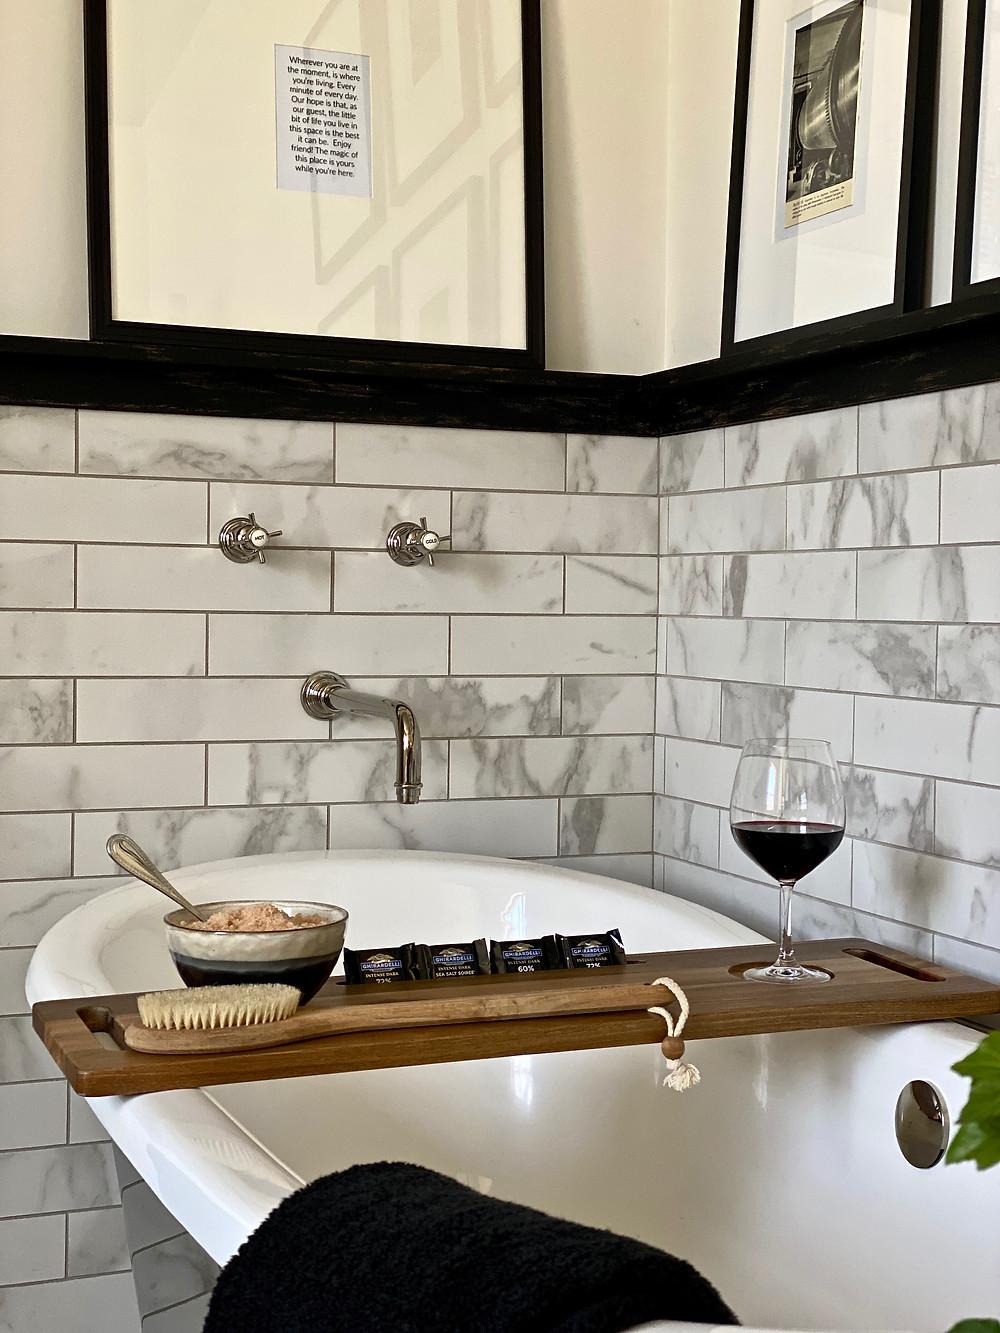 Spa bath, stainless steel bathtub, black and white bathrooms, guest retreat, bathroom design